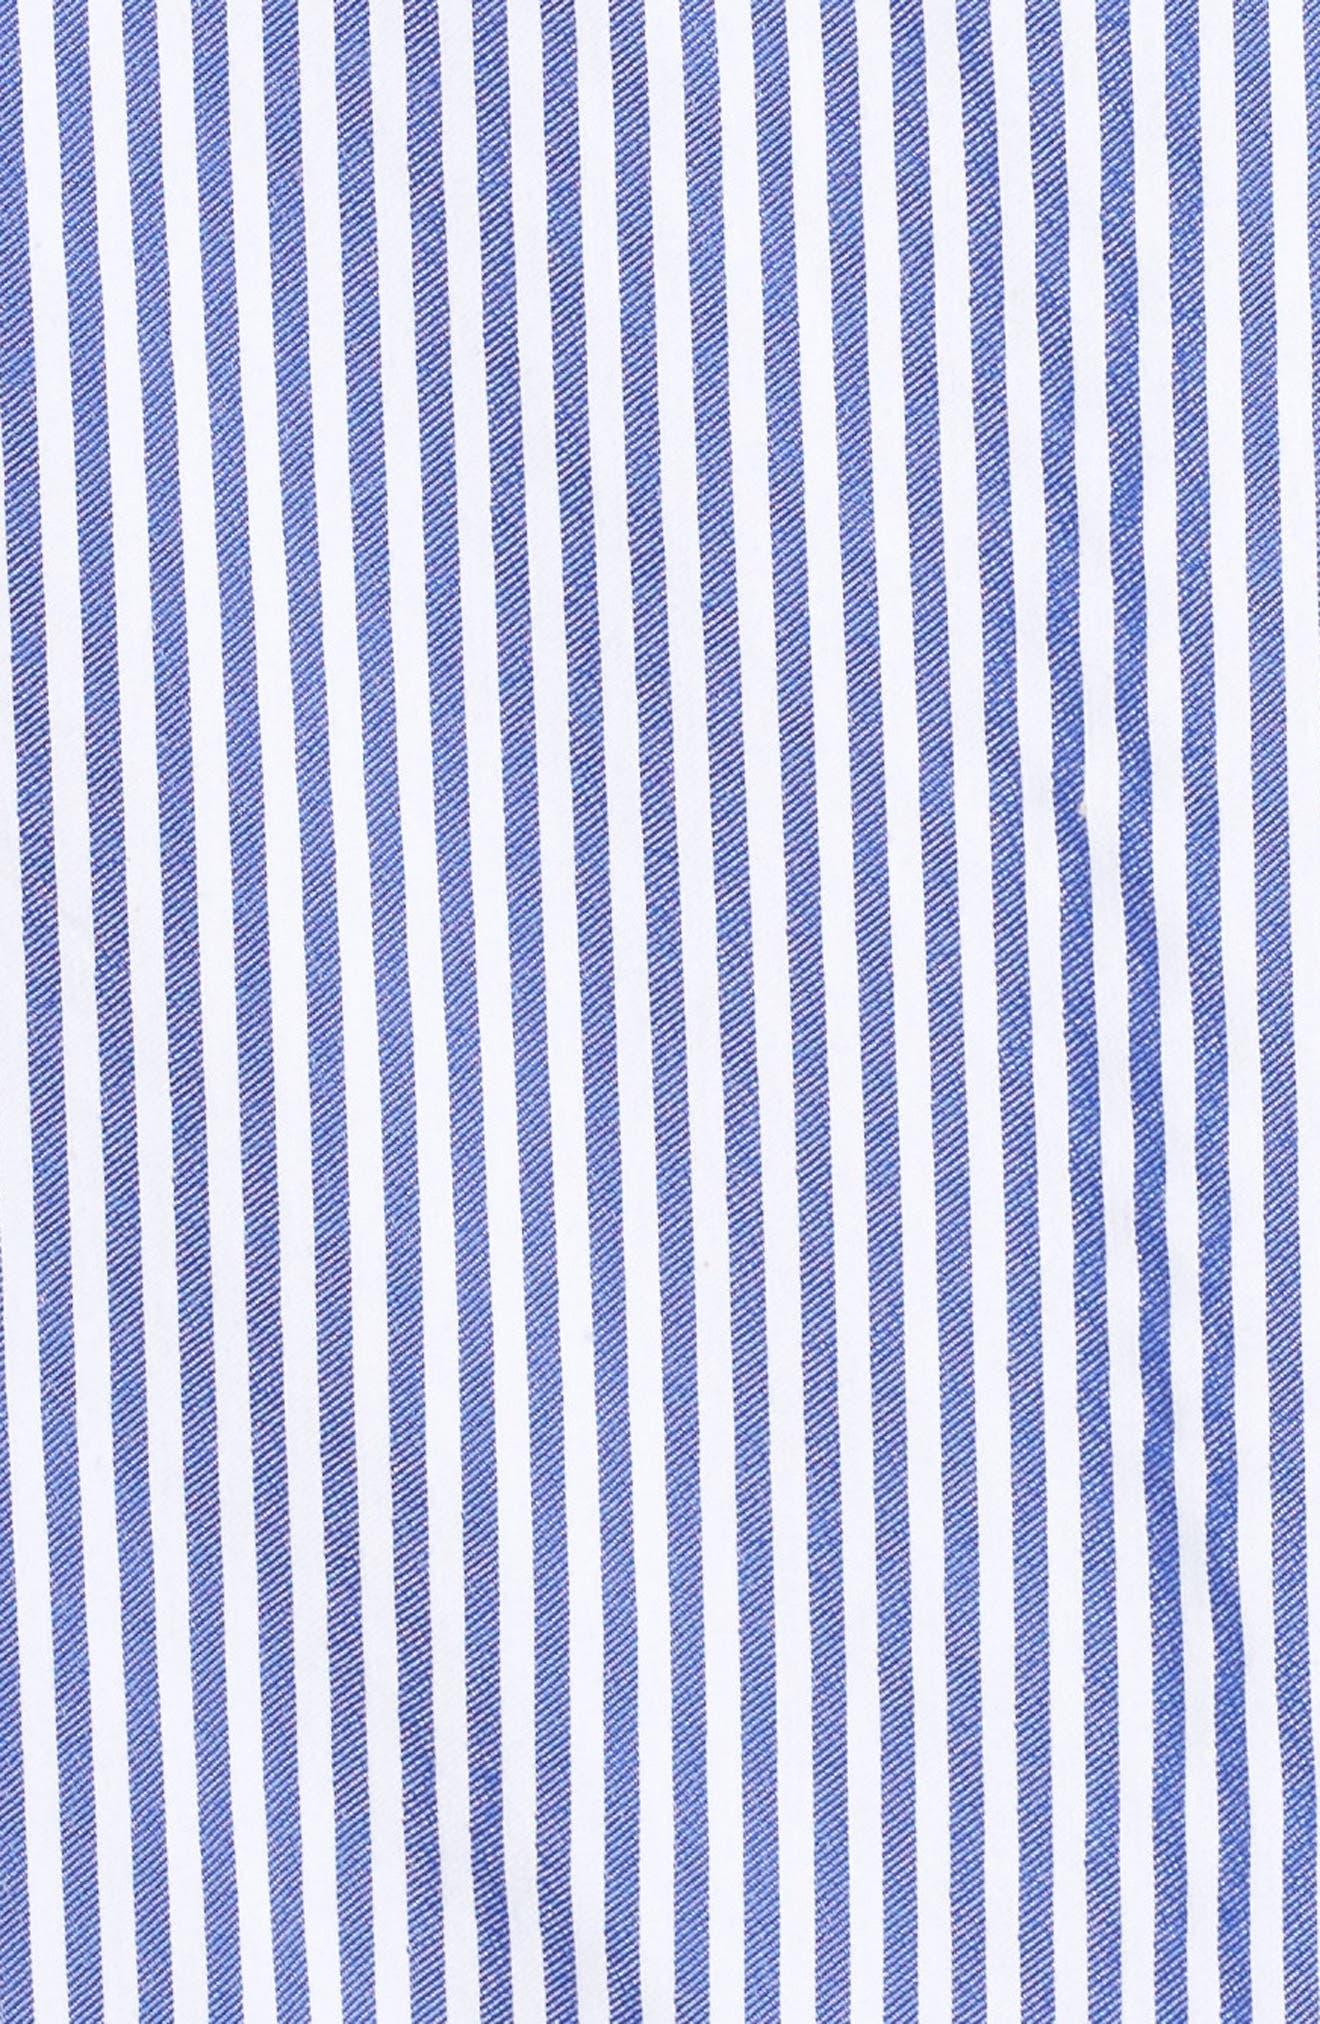 Embroidered Hem Stripe Off the Shoulder Shift Dress,                             Alternate thumbnail 5, color,                             BLUE/ WHITE